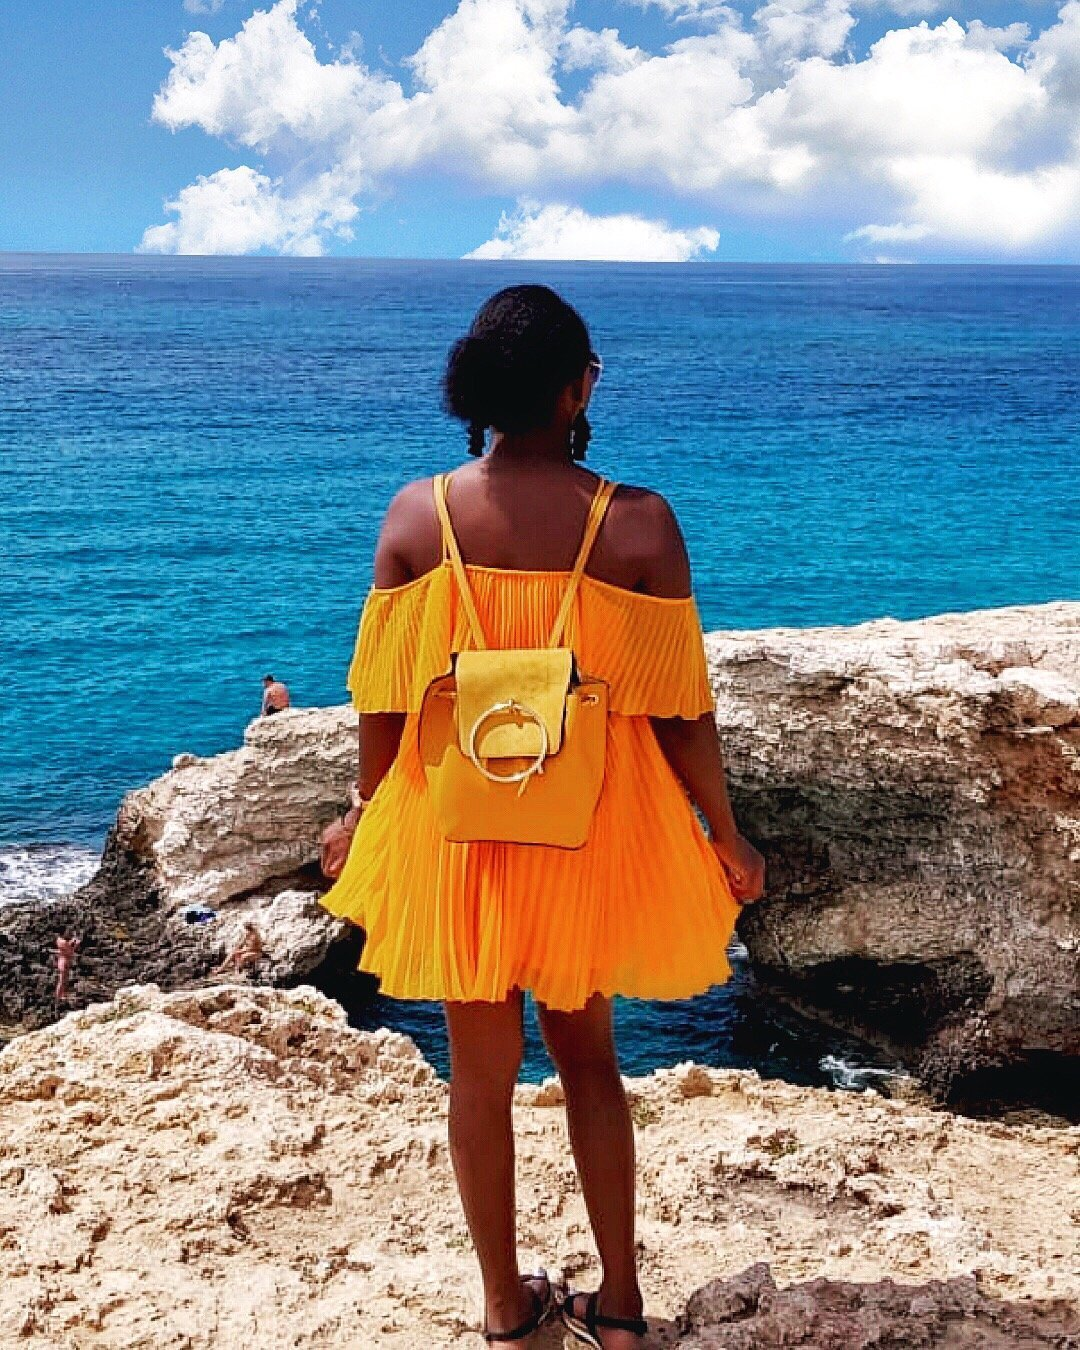 Stephylately overlooking the Mediterranean sea